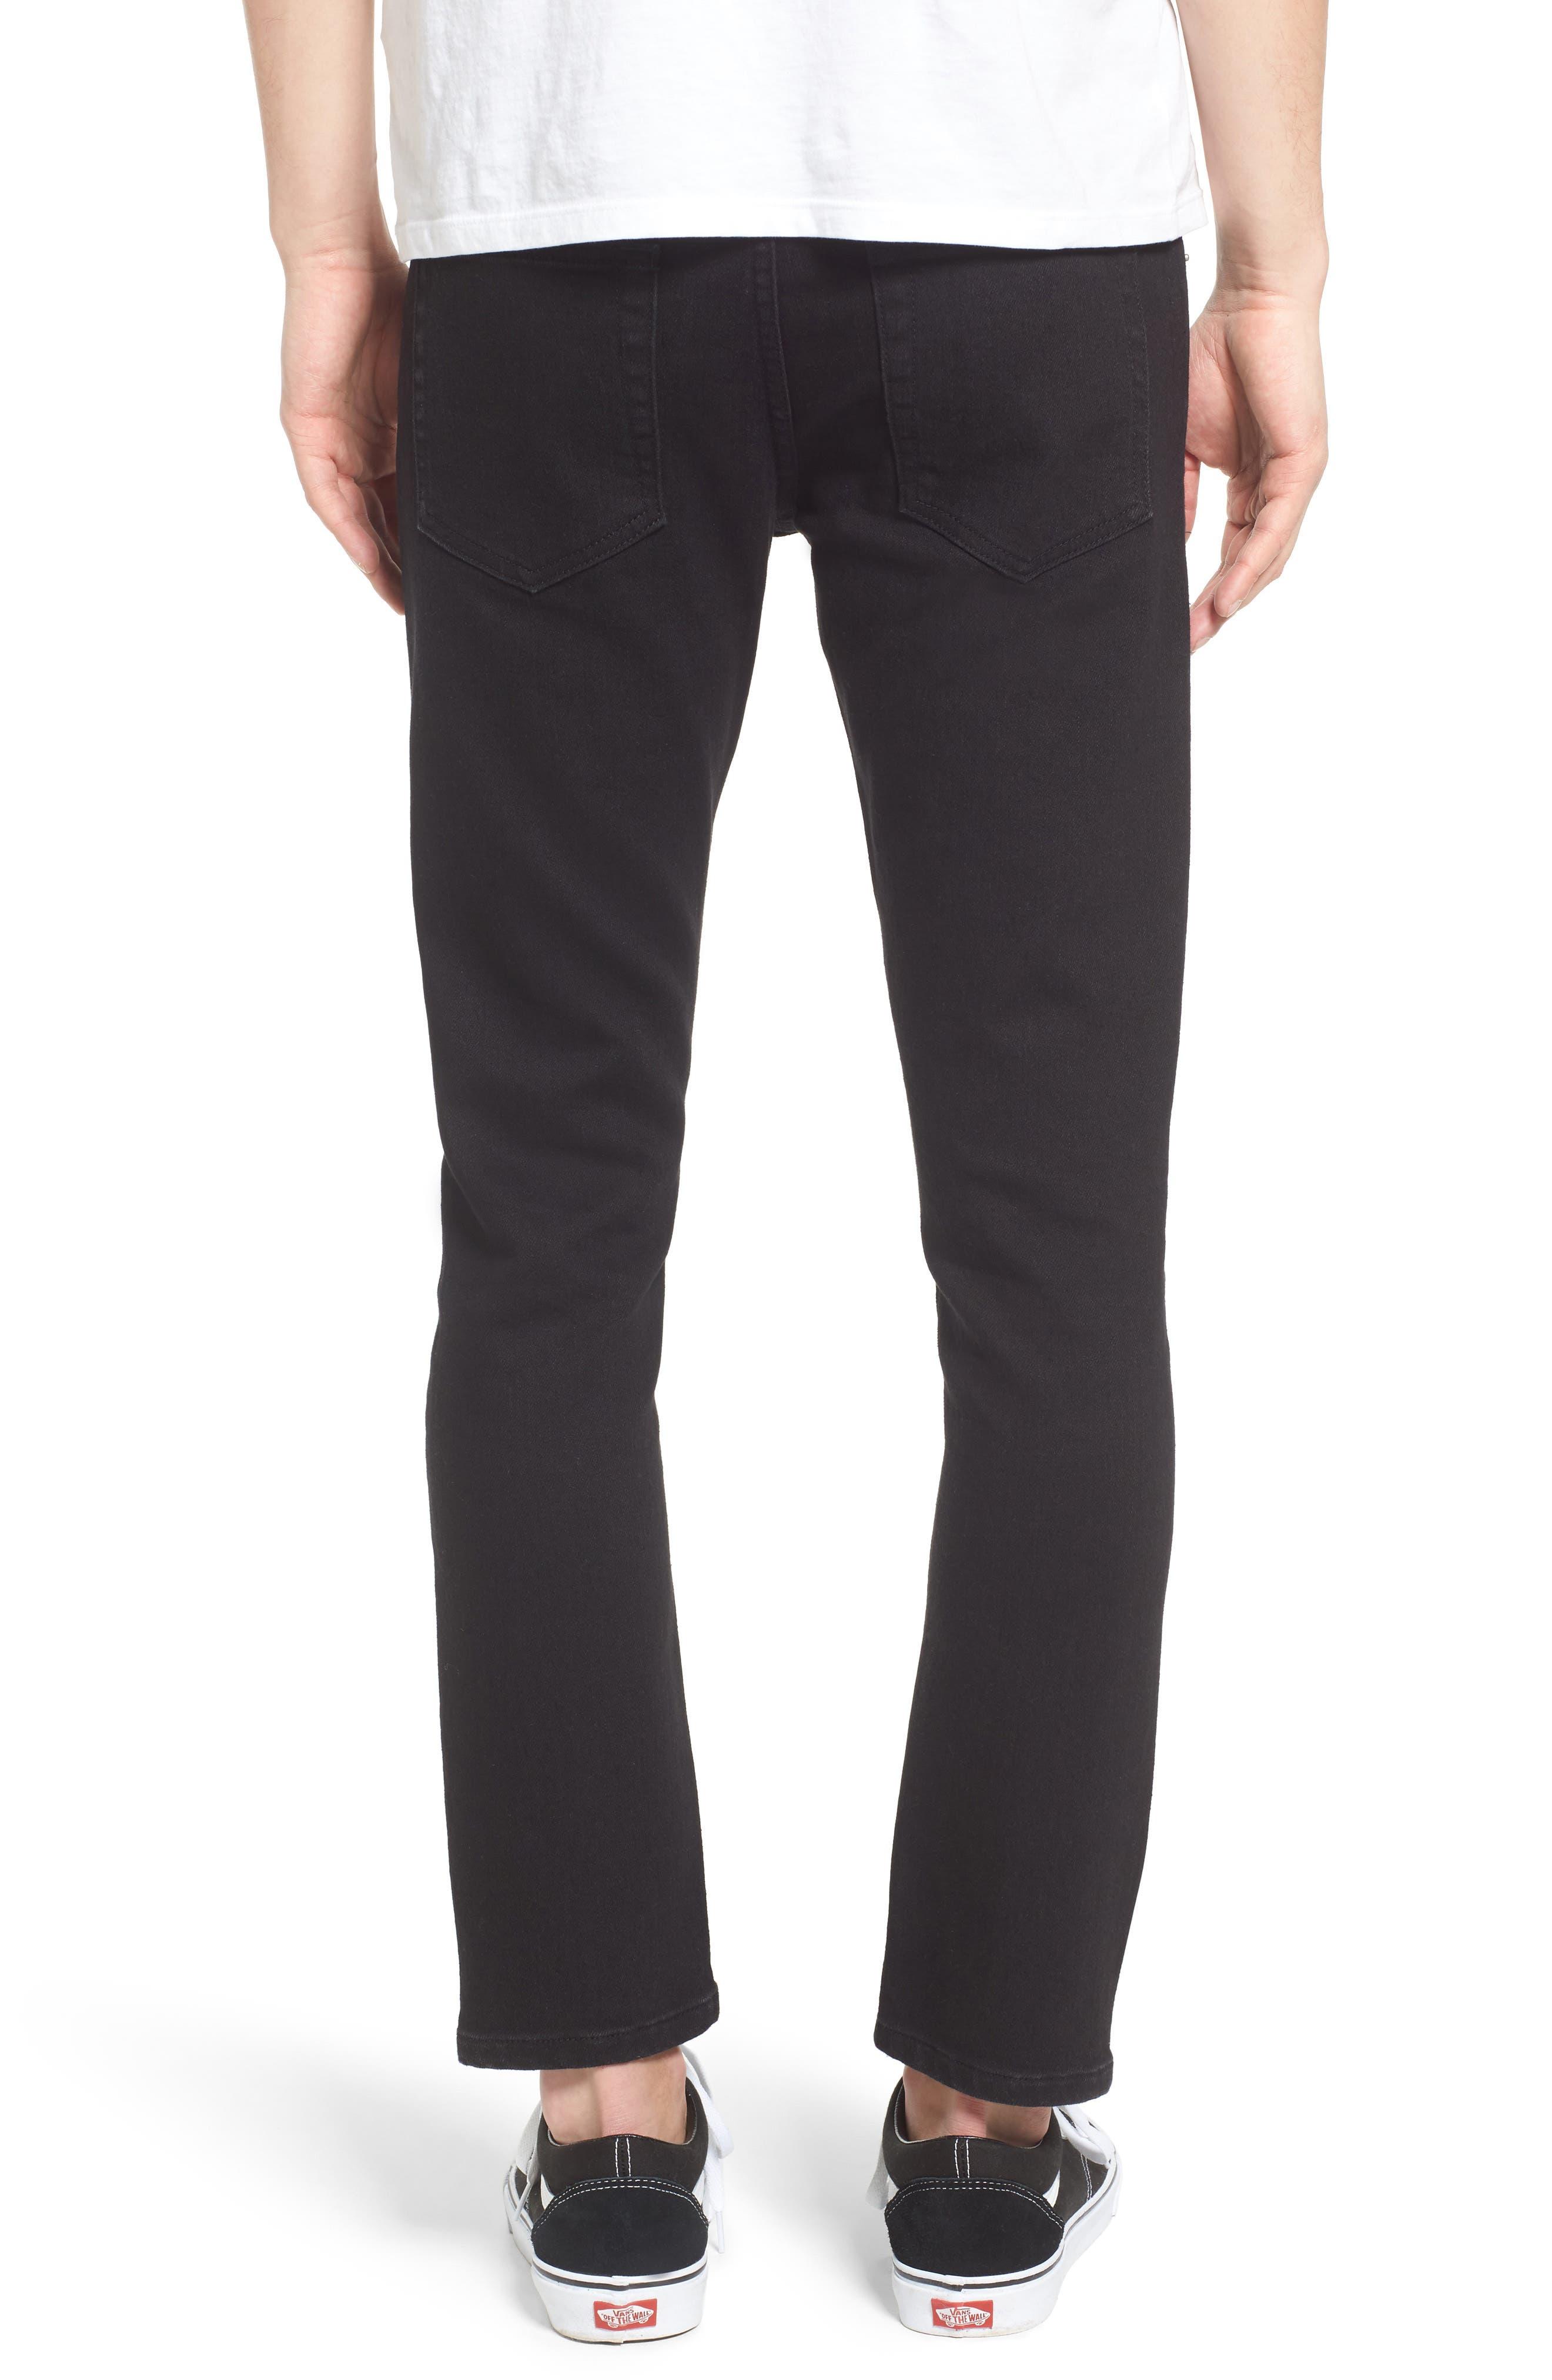 Juvee II Flooded Skinny Fit Jeans,                             Alternate thumbnail 2, color,                             001